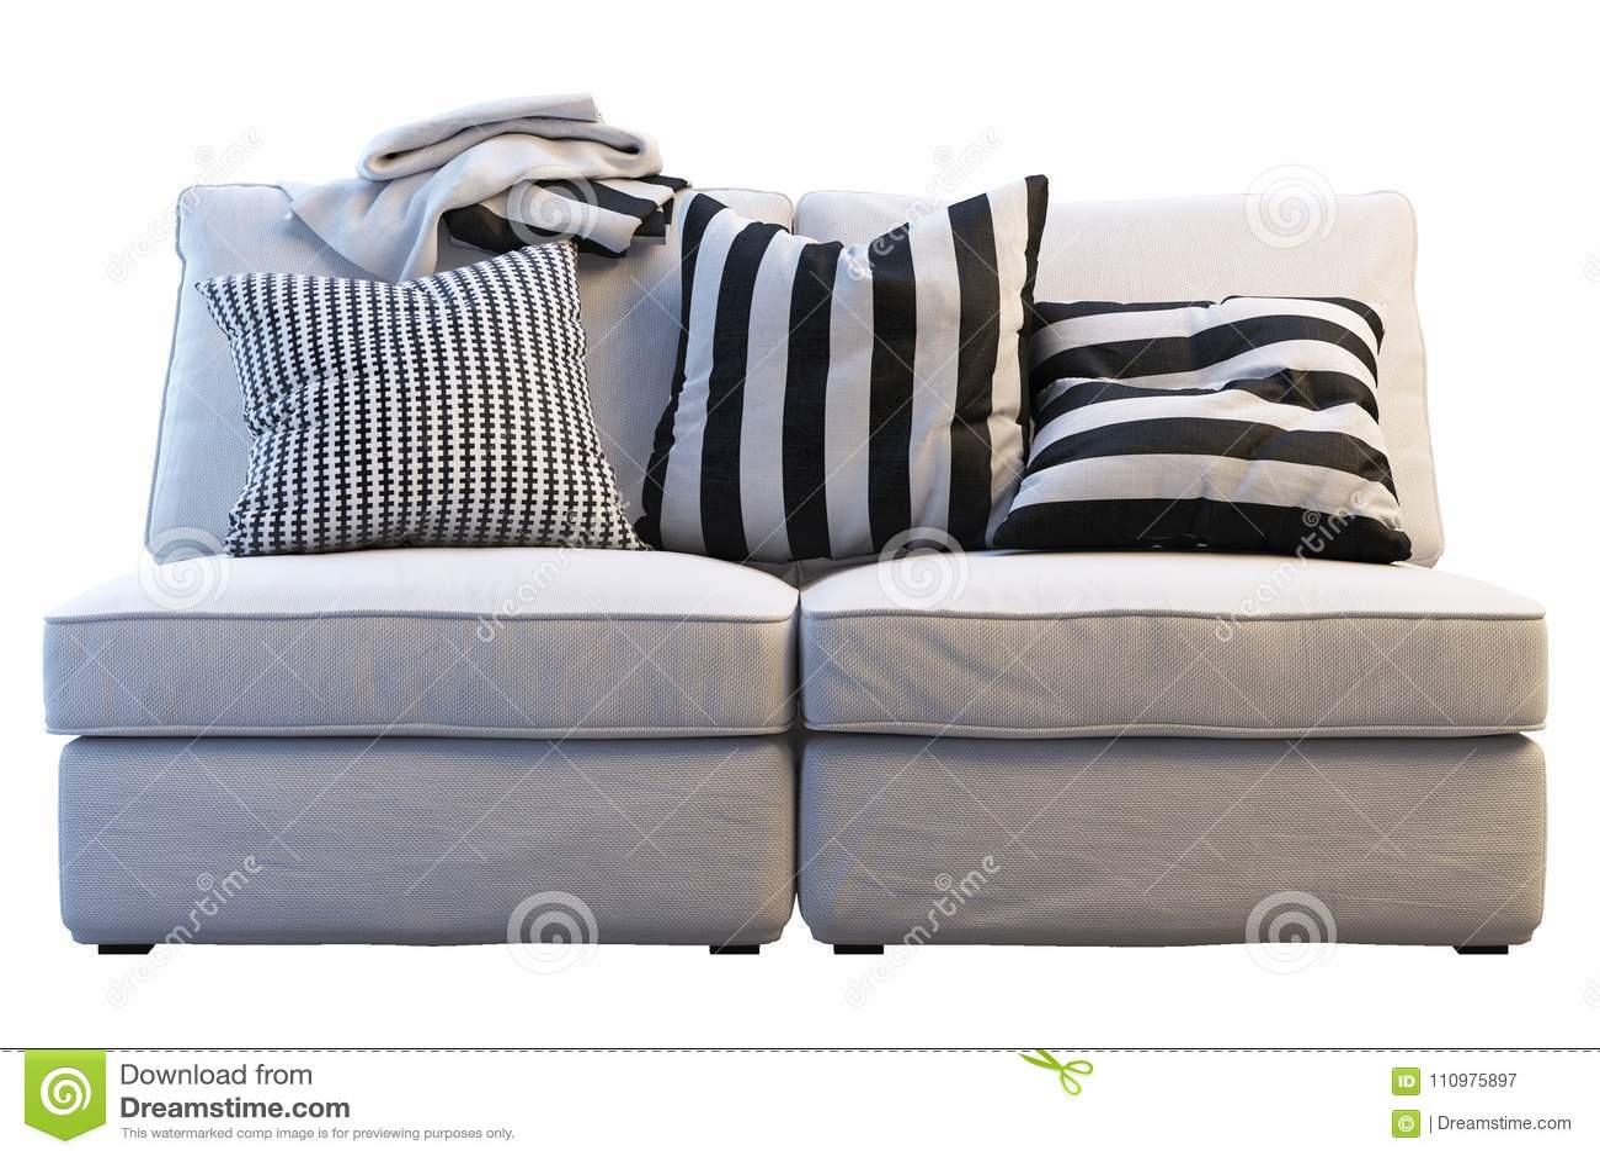 Groovy Ikea Kivik Sofa With Plaids And Pillows Stock Image Image Download Free Architecture Designs Estepponolmadebymaigaardcom